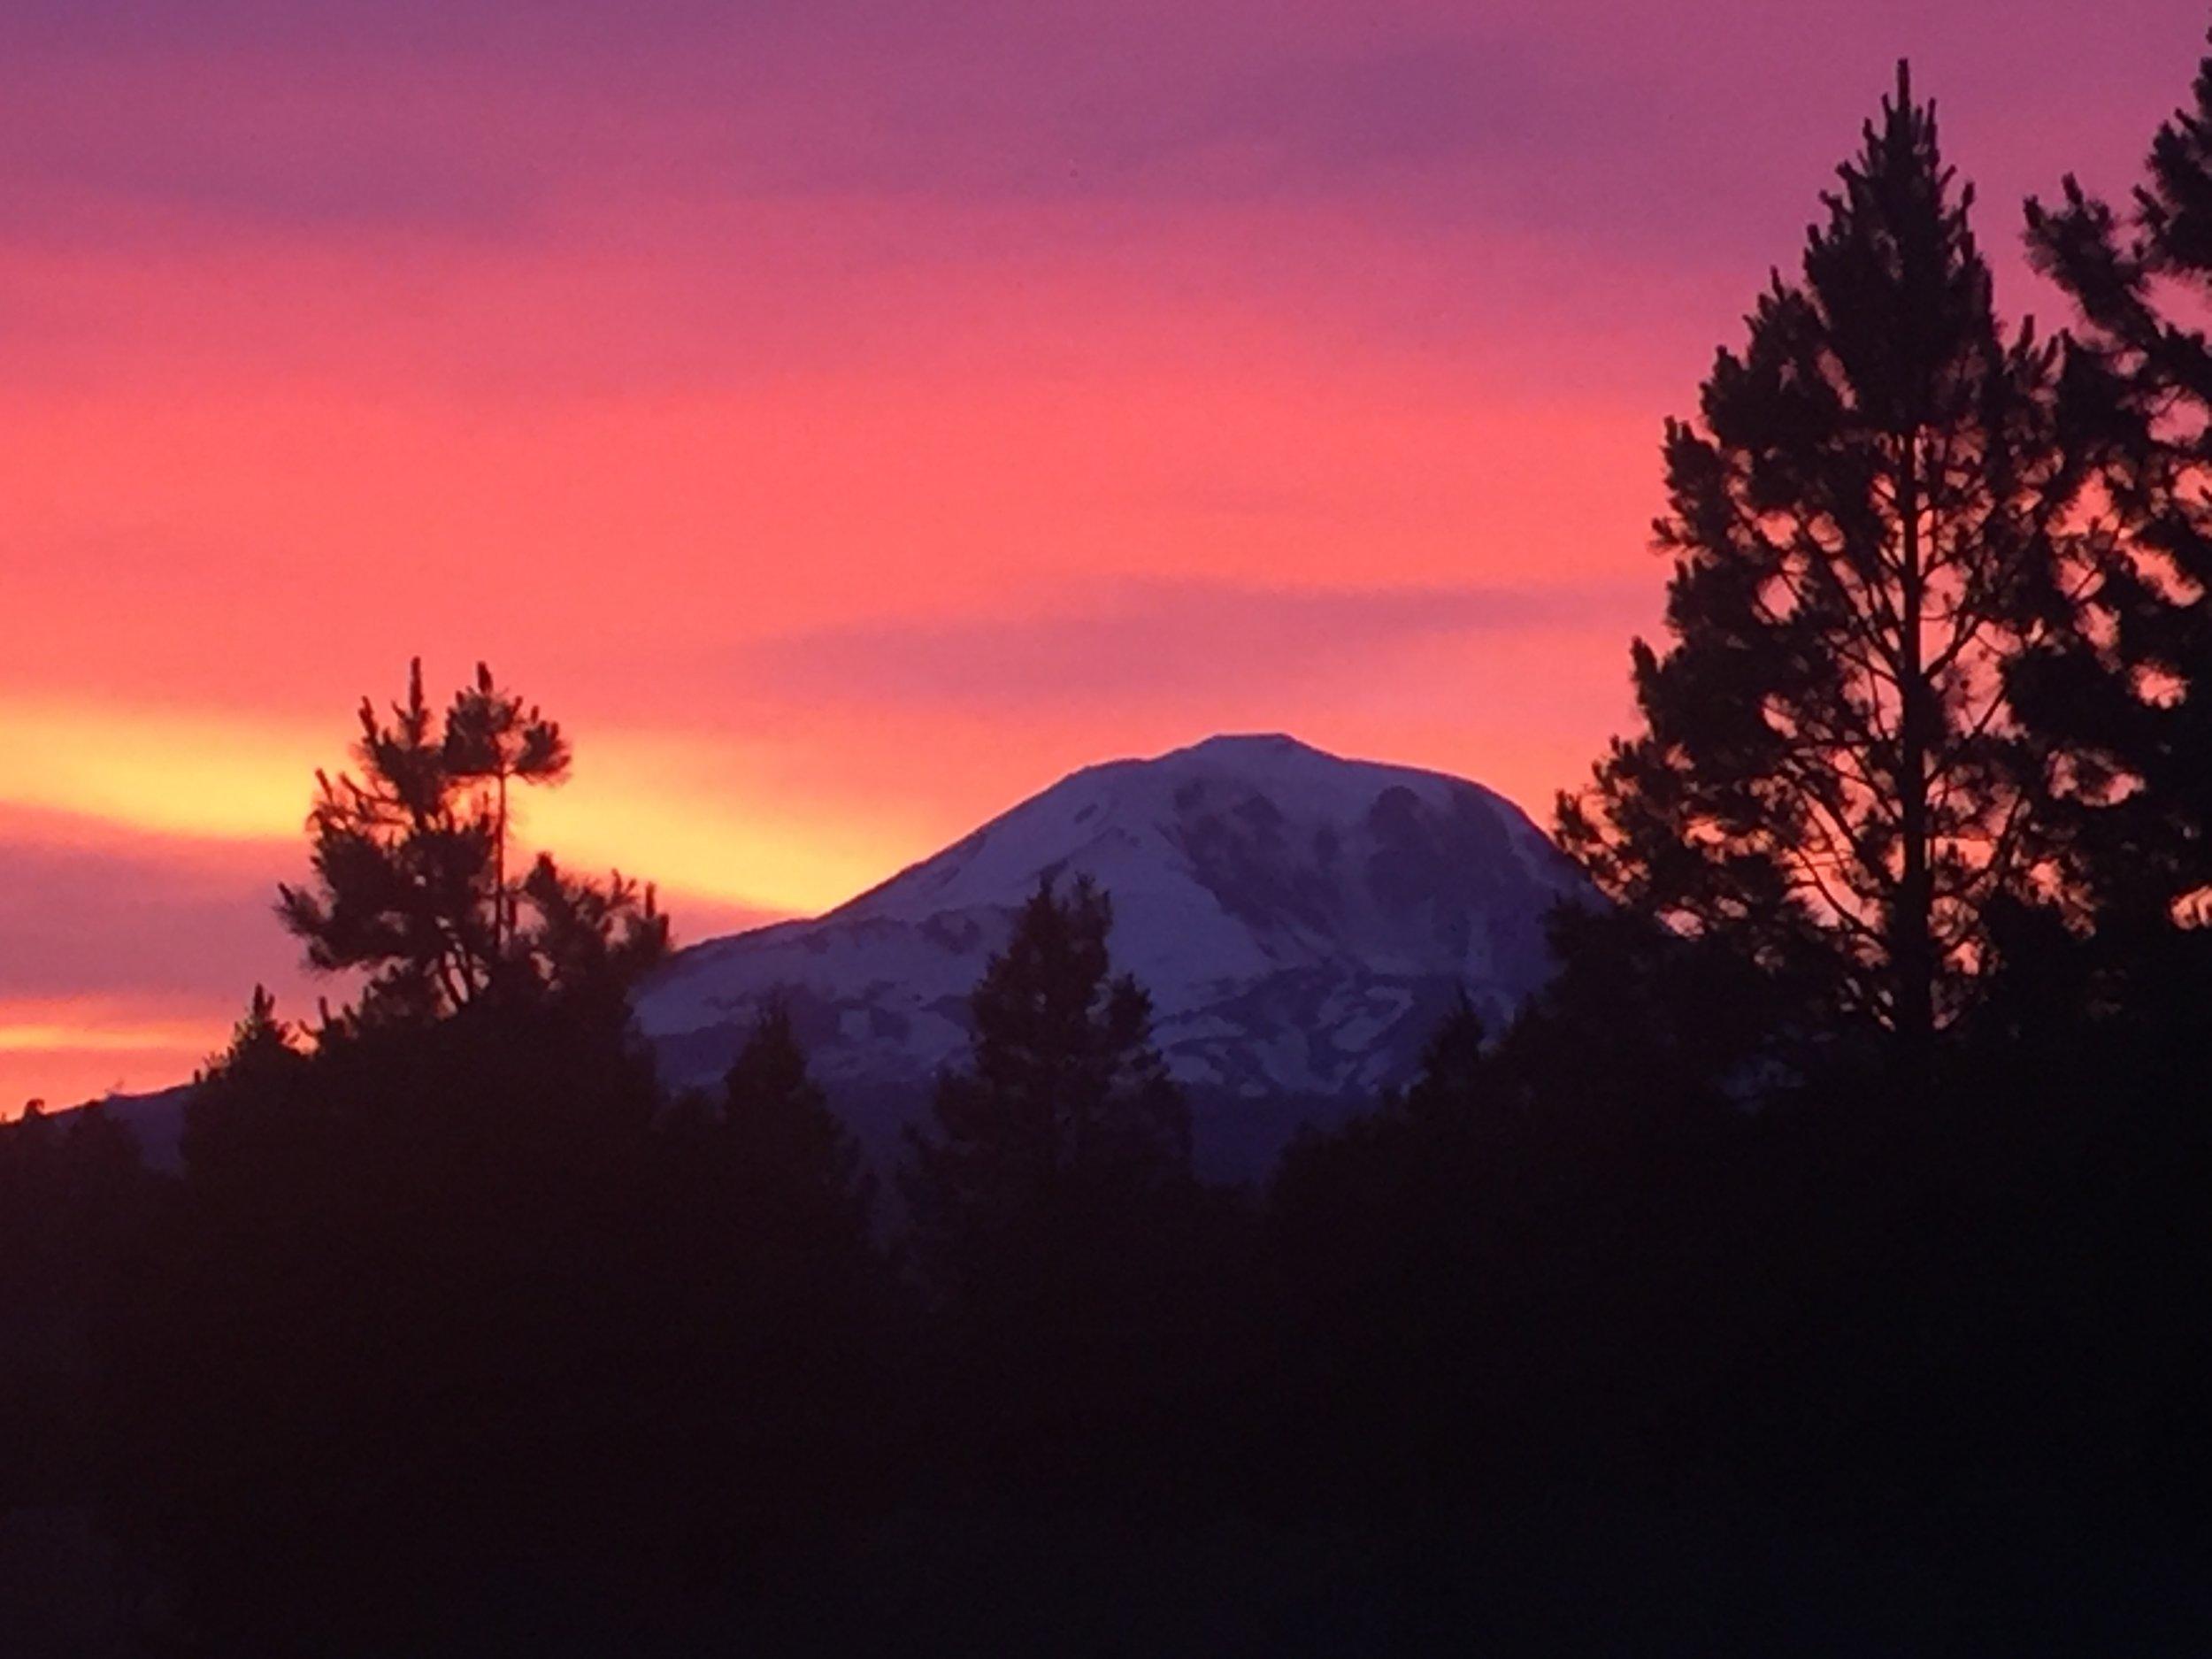 Sunset on Mt. Adams - Tom Pierson